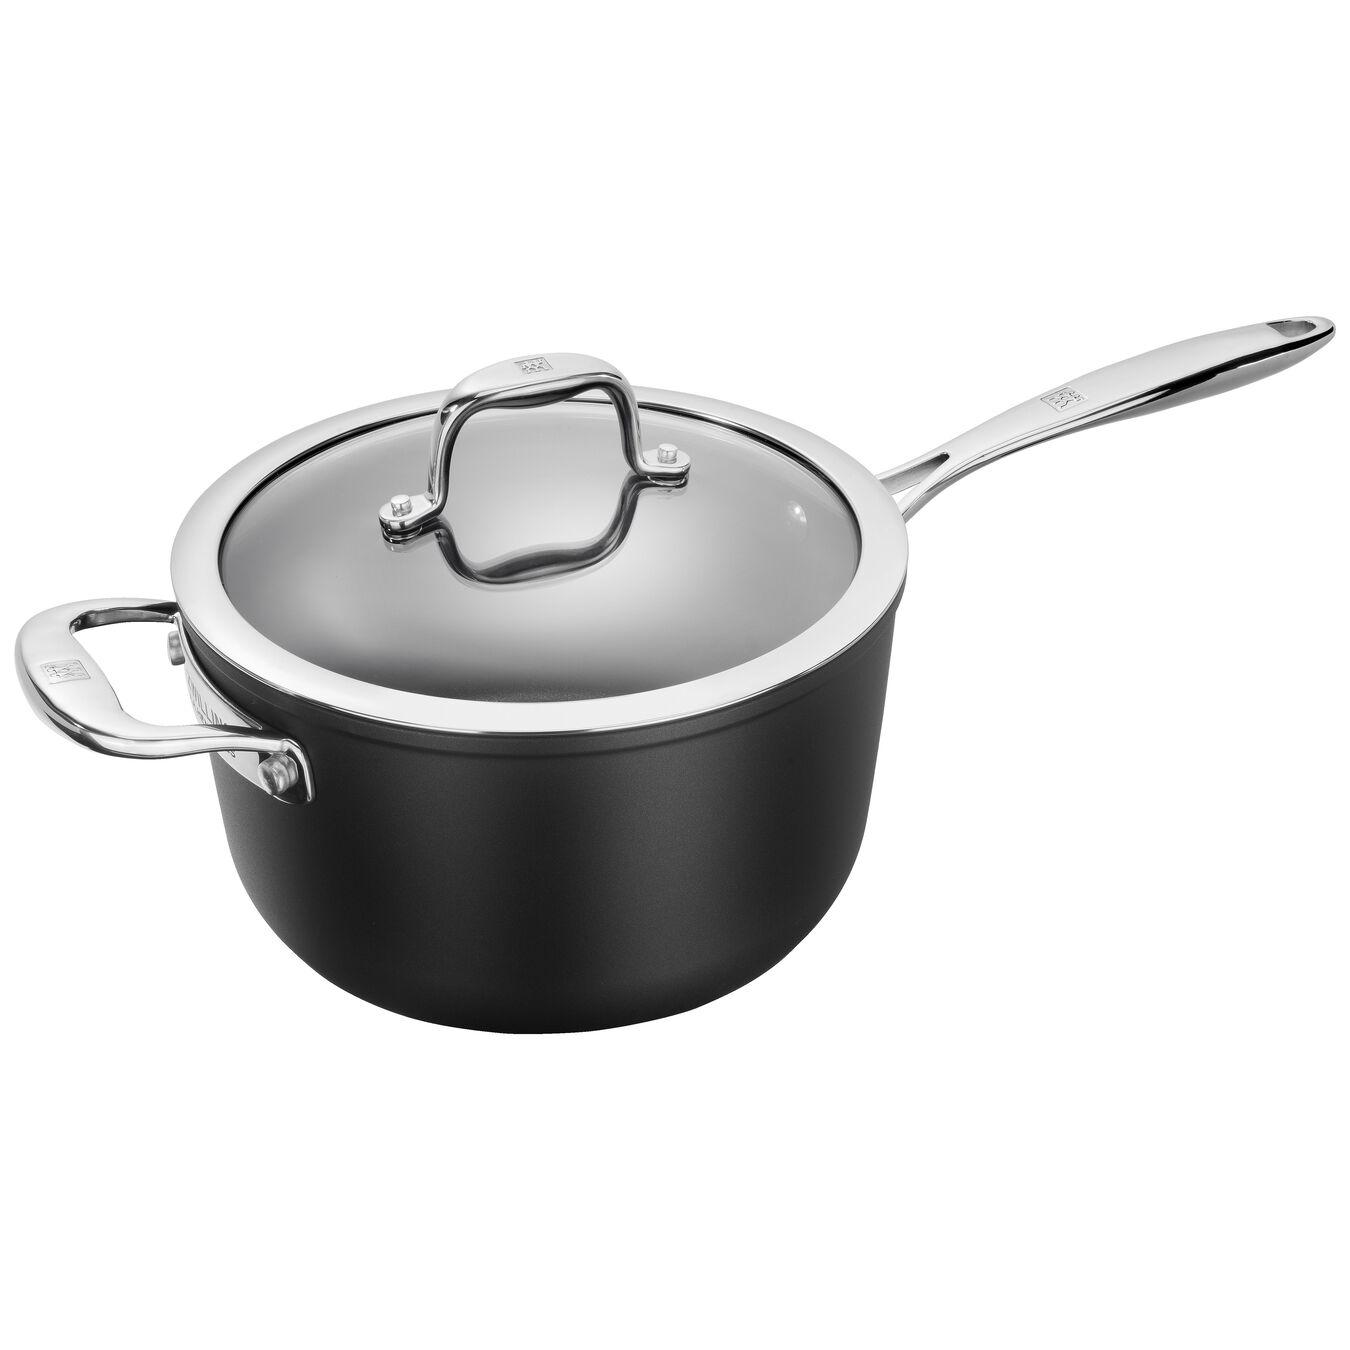 Aluminum round Sauce pan, Silver-Black,,large 1